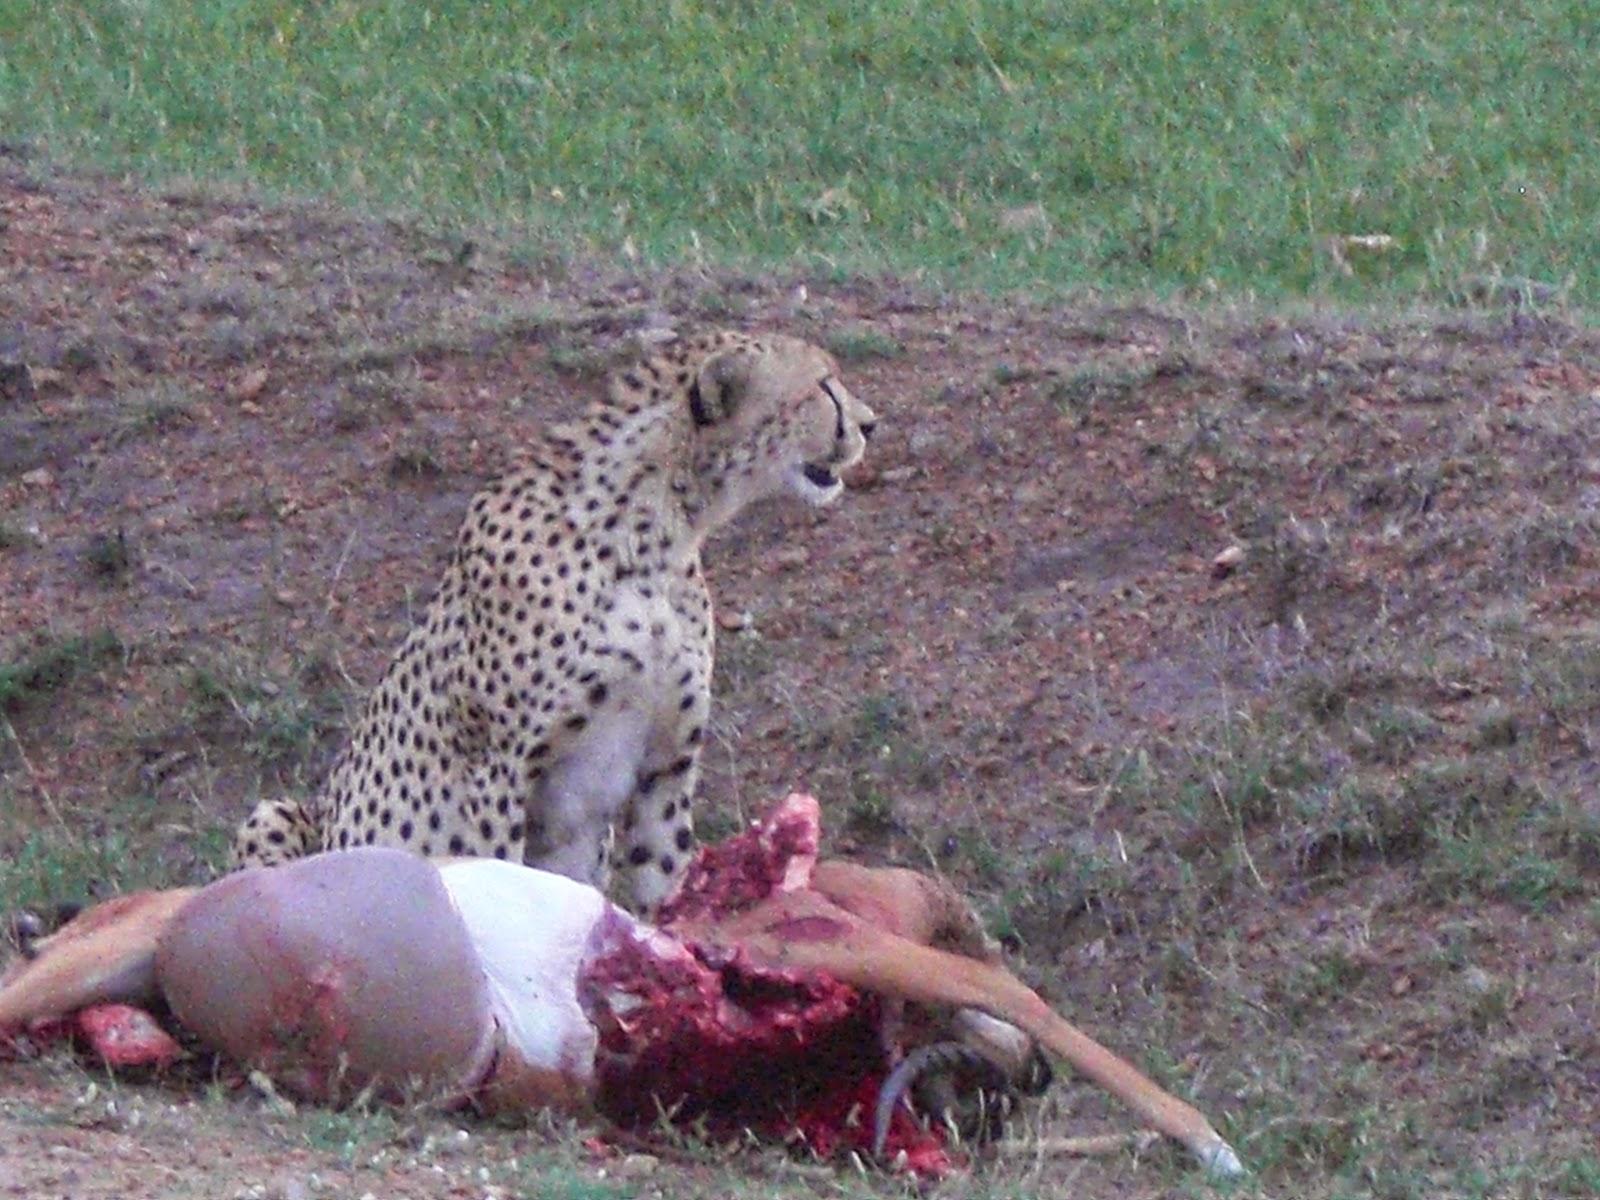 hvad spiser en gepard